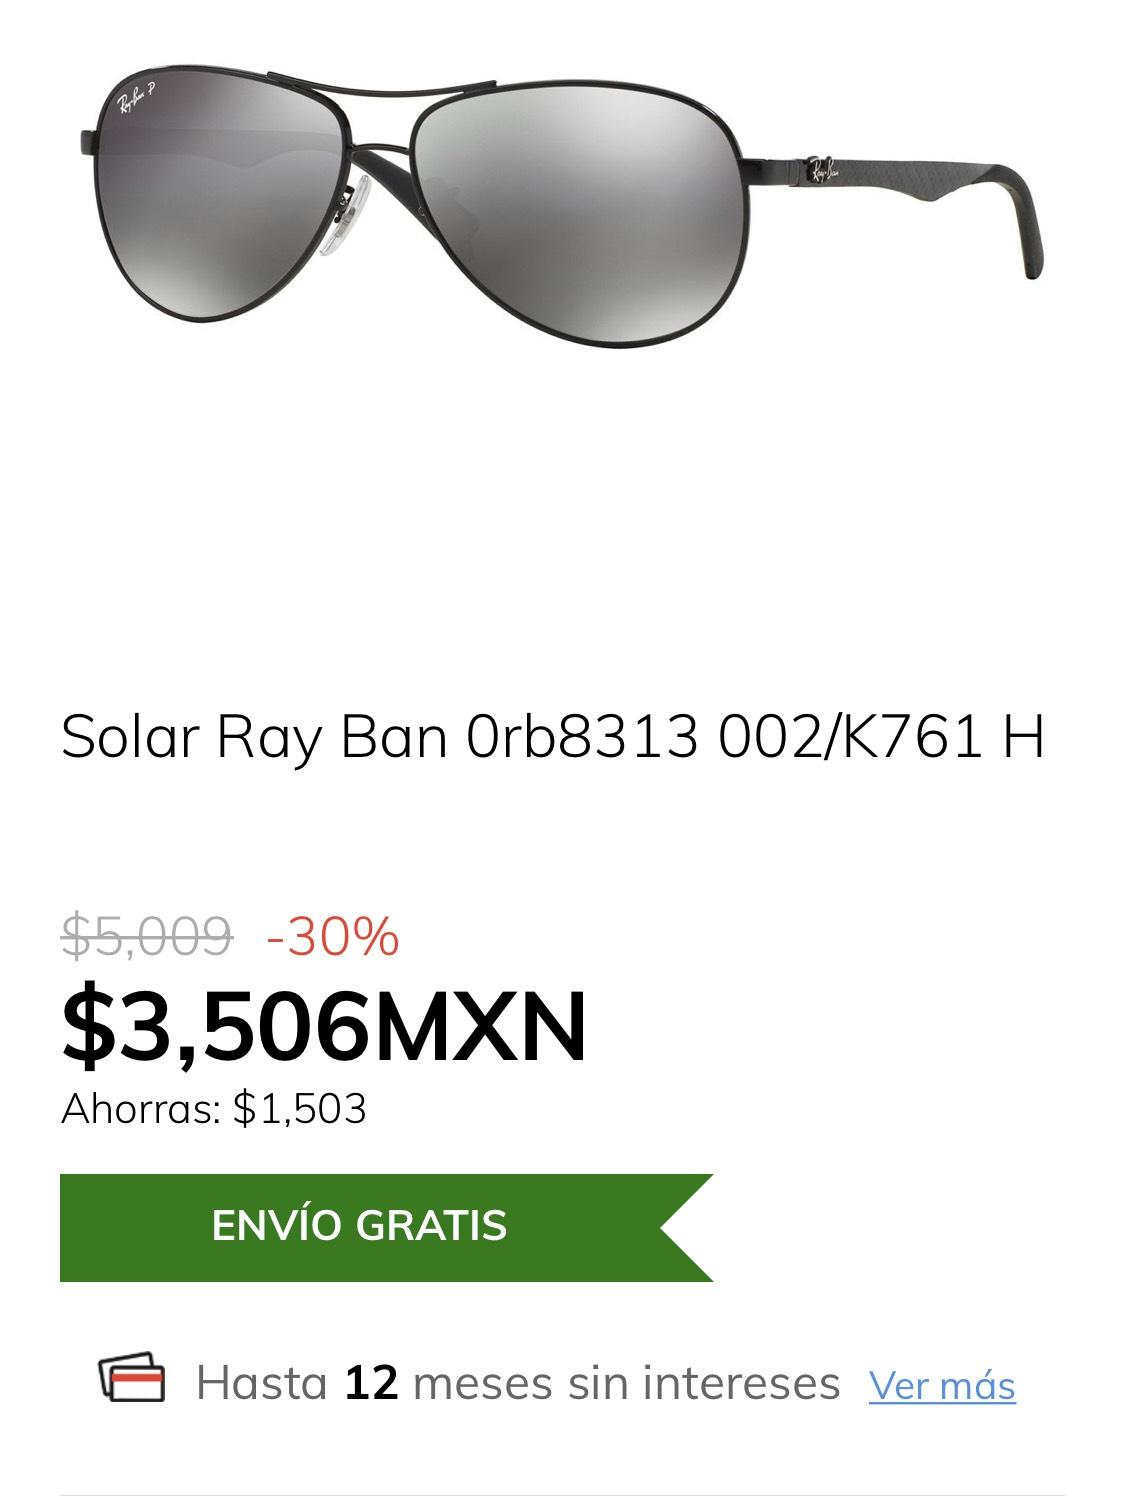 Claroshop: Solar Ray Ban 0rb8313 002/K761 H